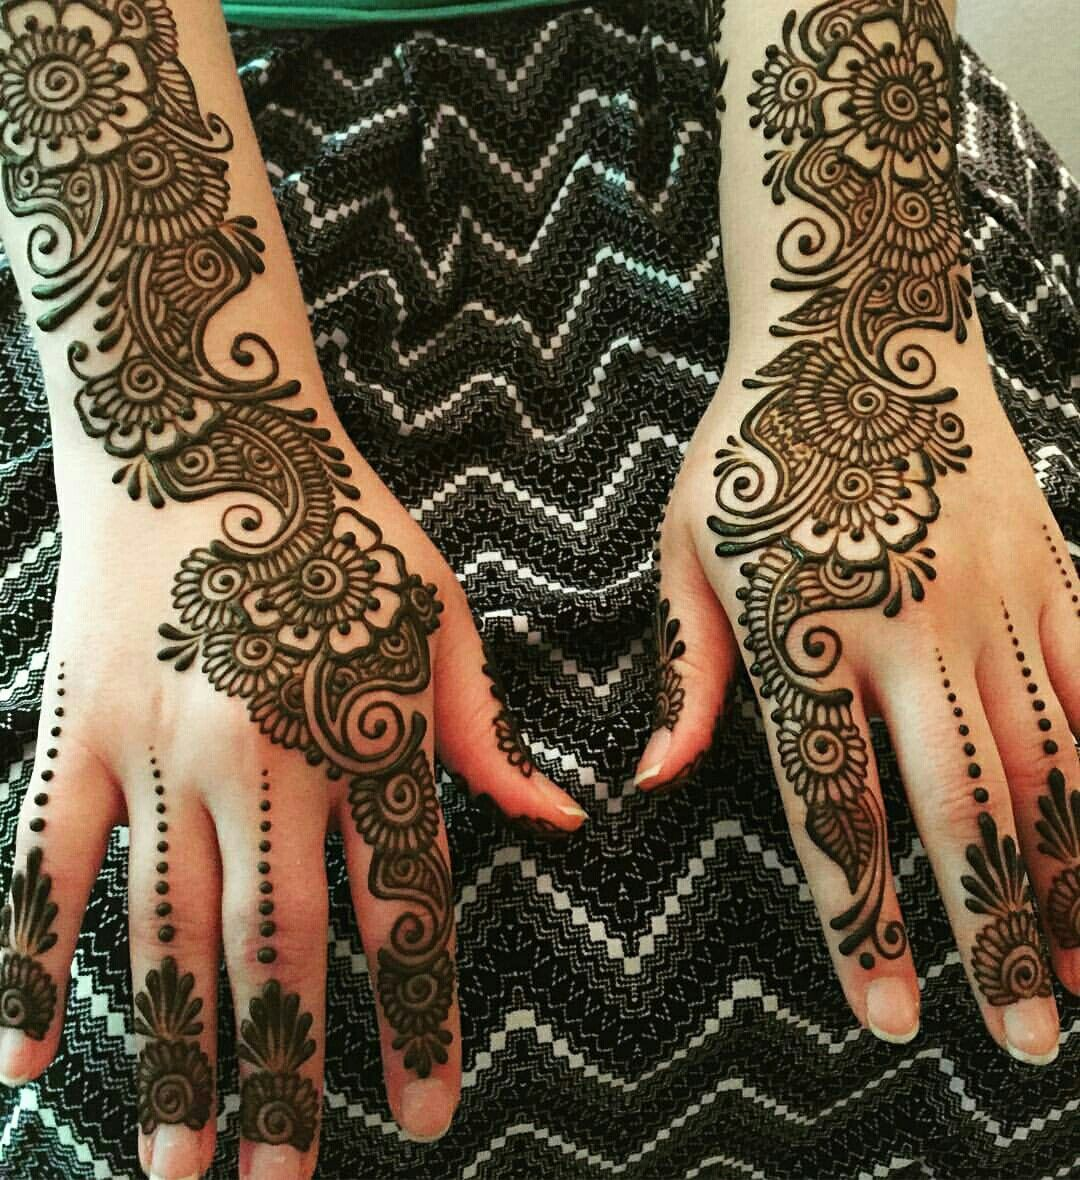 50 intricate henna tattoo designs art and design 50 - Henna Art Henna Mehndi Hena Designs Simple Henna Designs Mehandi Designs Easy Mehndi Simple Tattoo Designs Mehndi Design Images Indian Mehndi